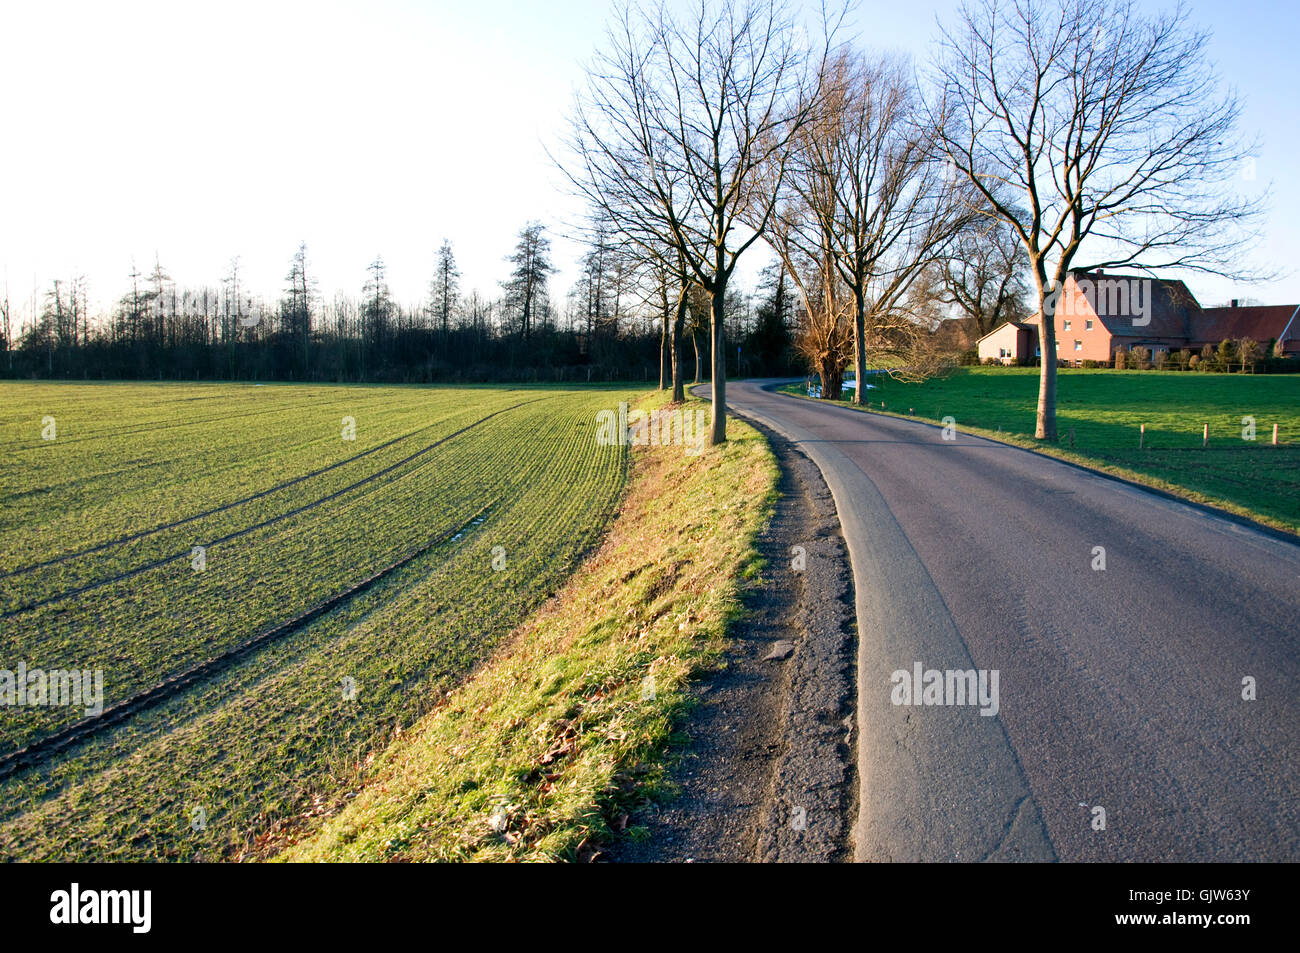 tree trees land - Stock Image